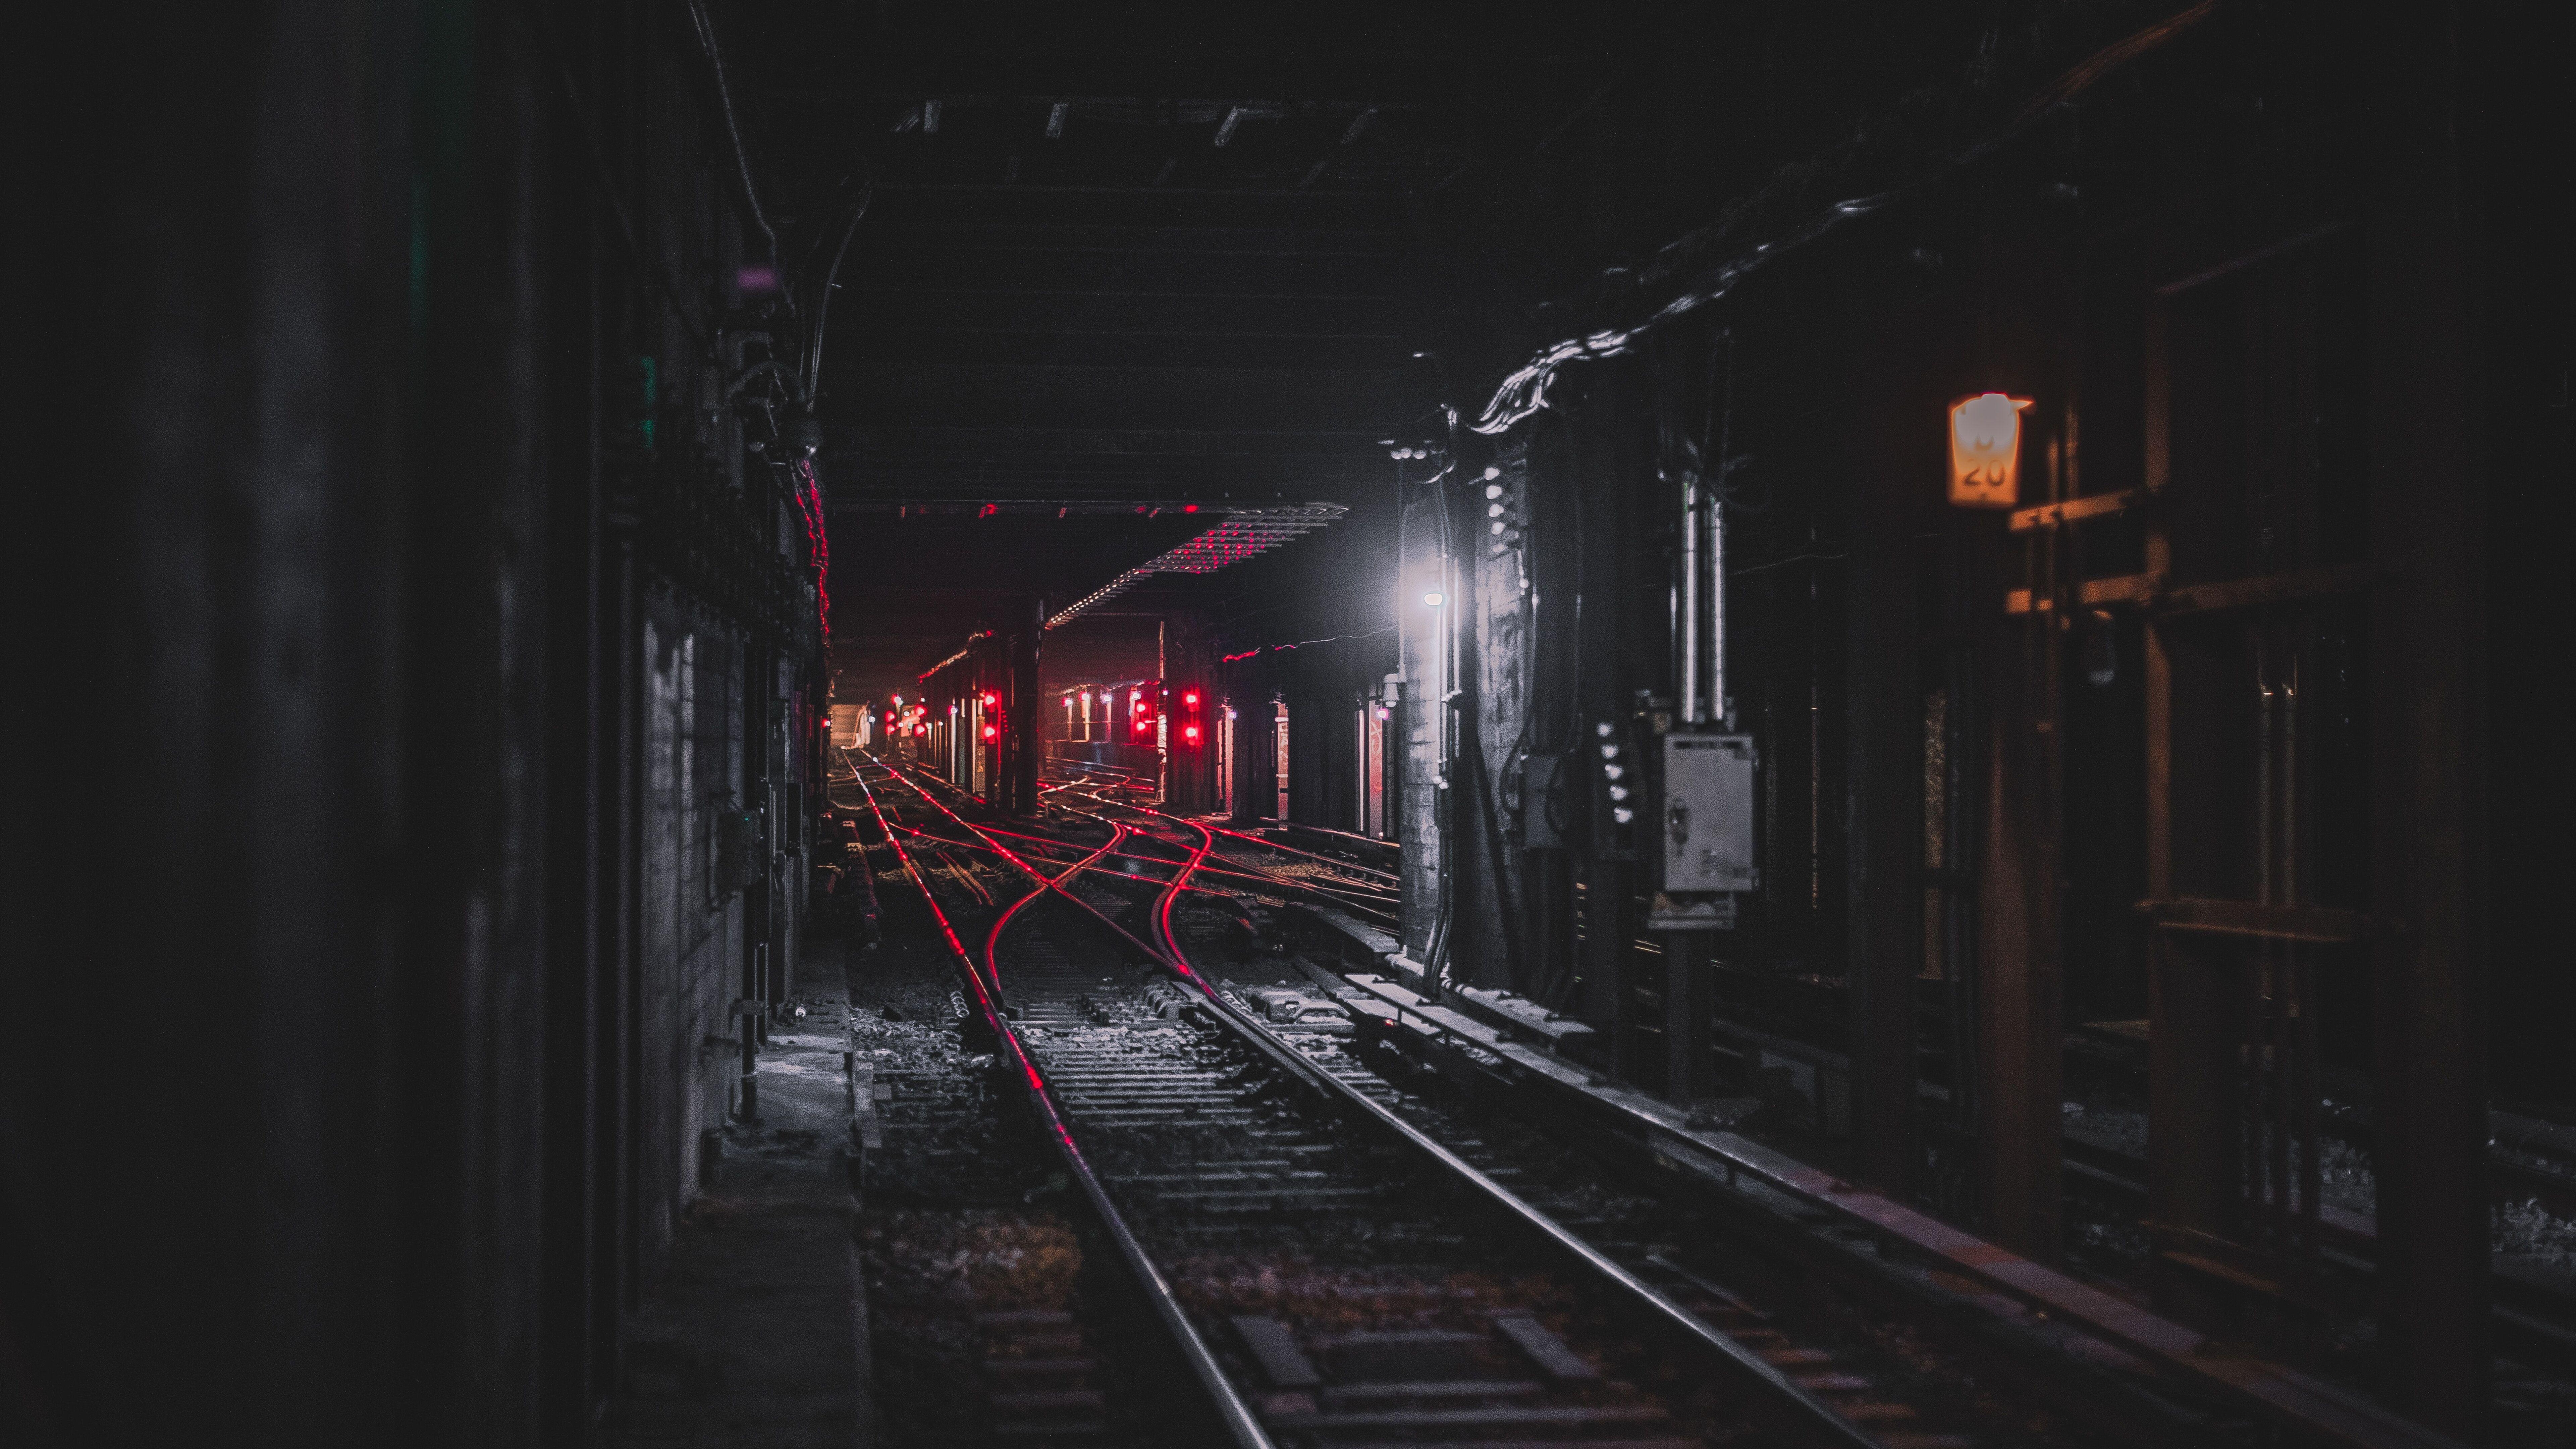 train-tunnel-8k-xs.jpg